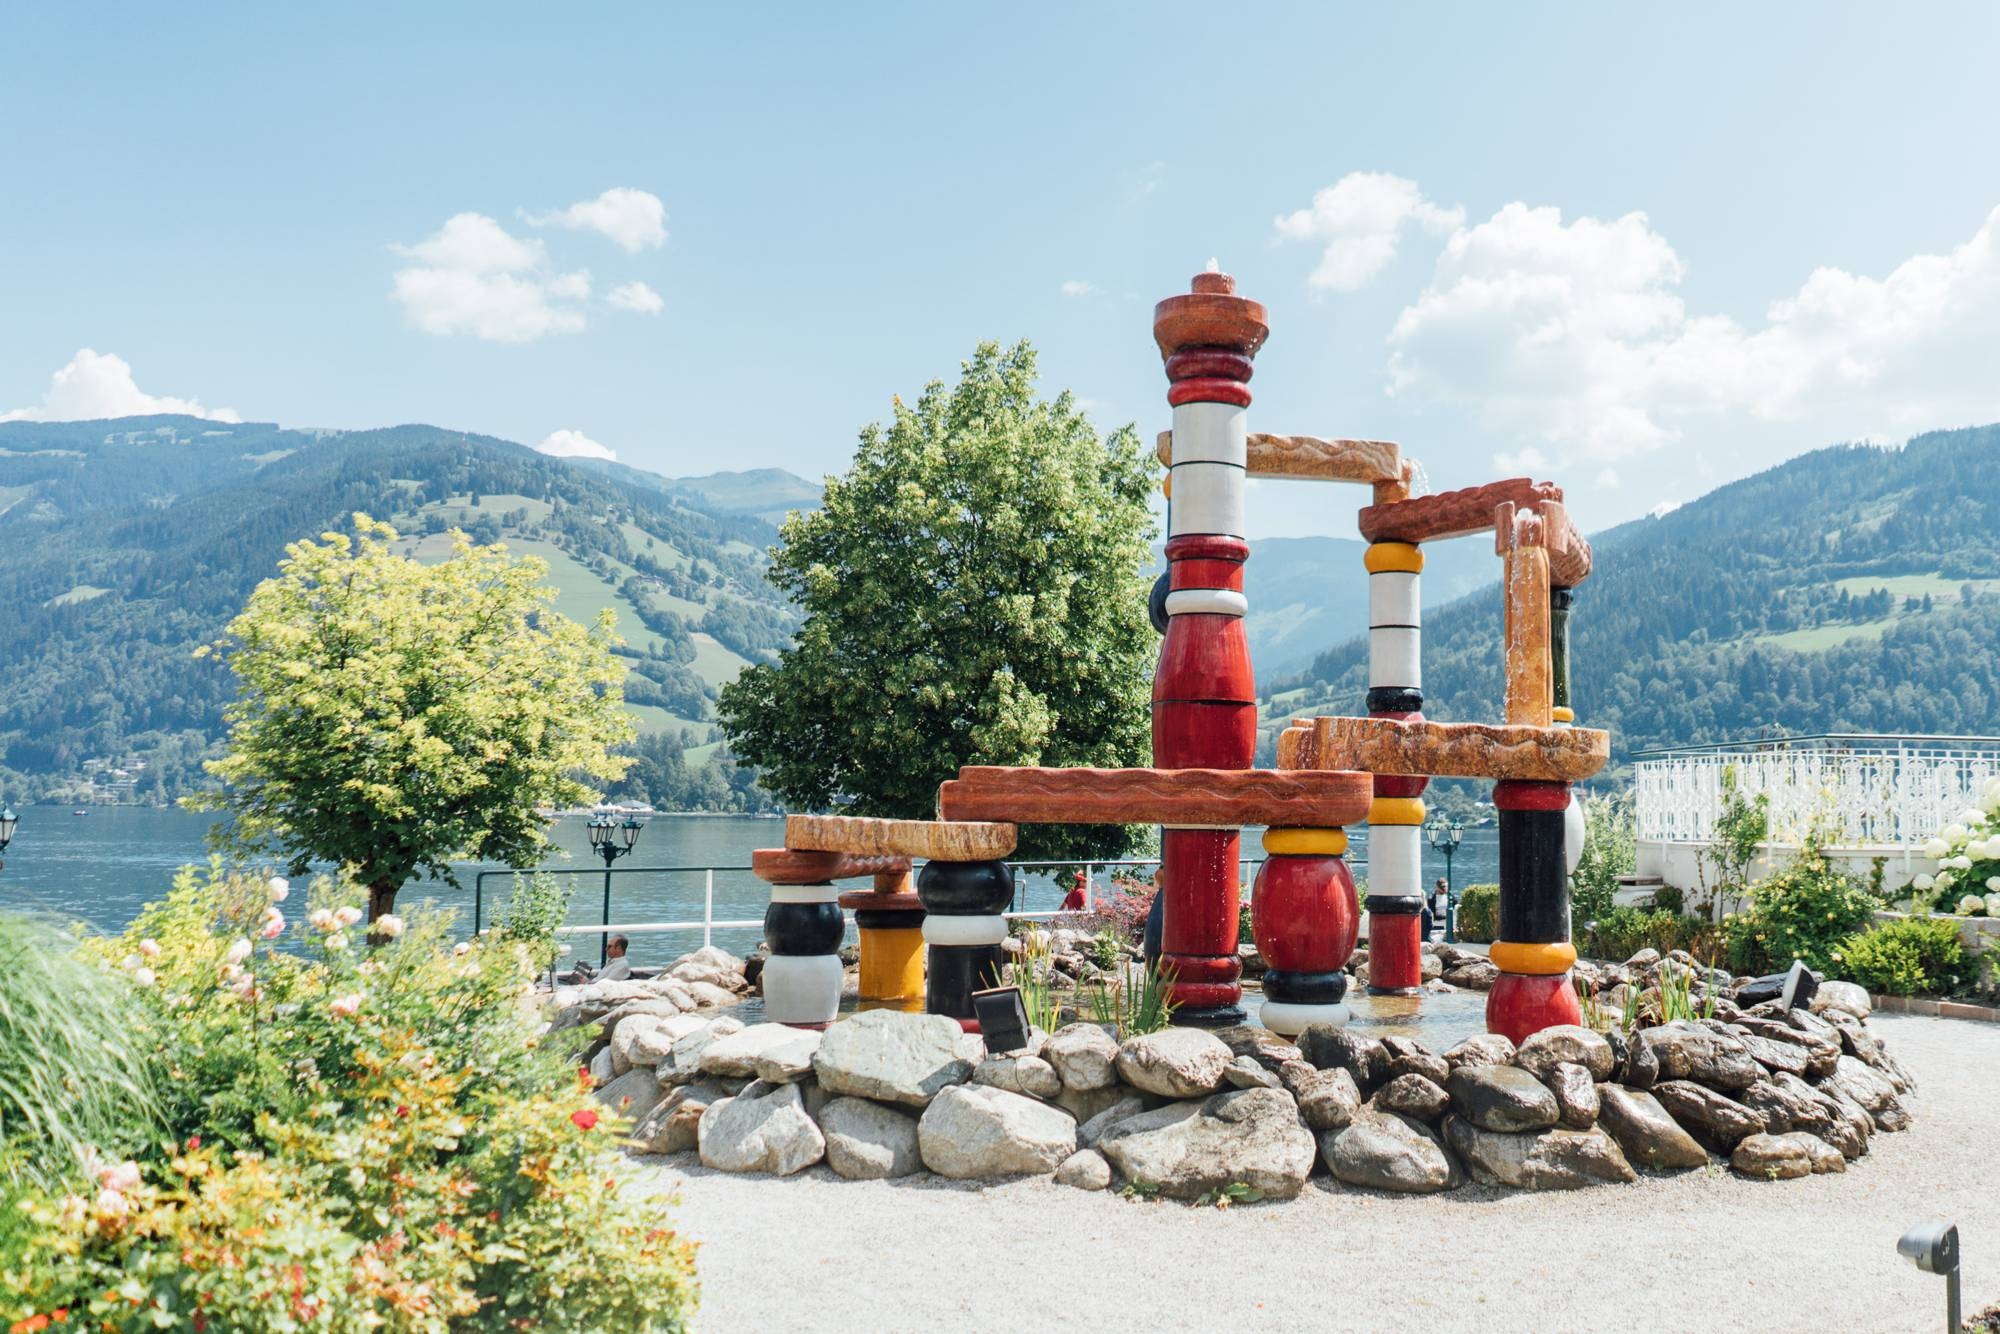 The Austrian Fountain